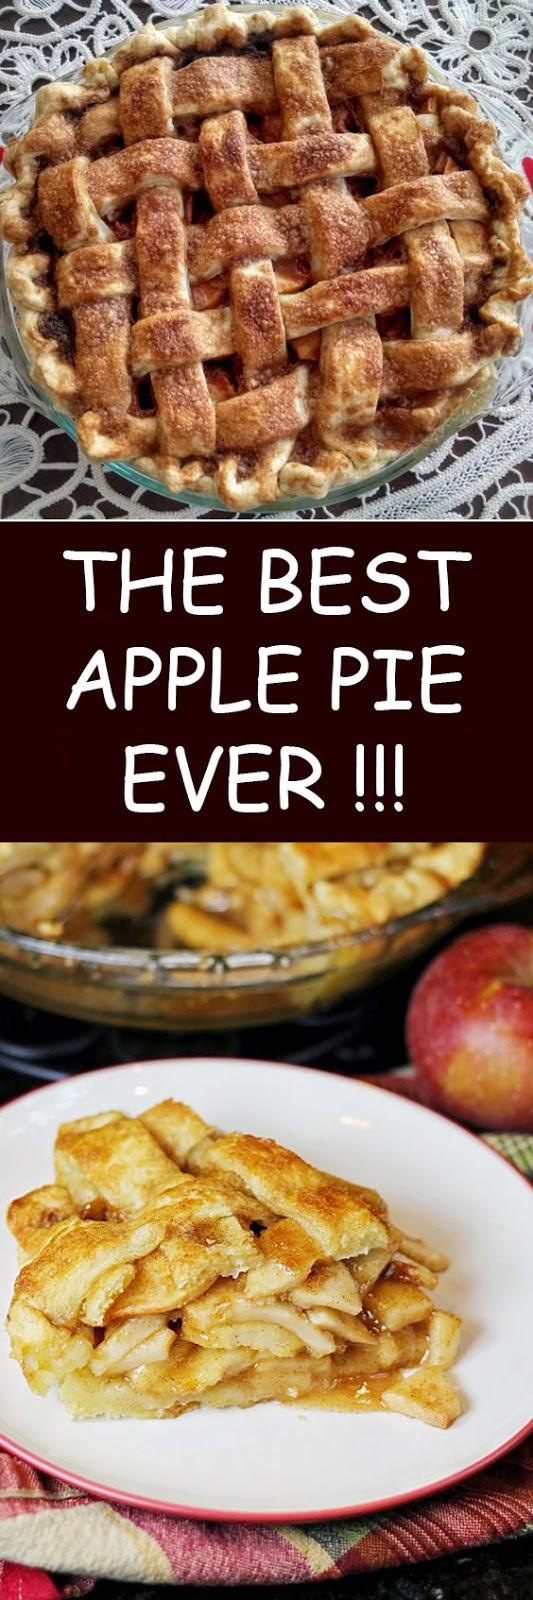 The Best Apple Pie Ever